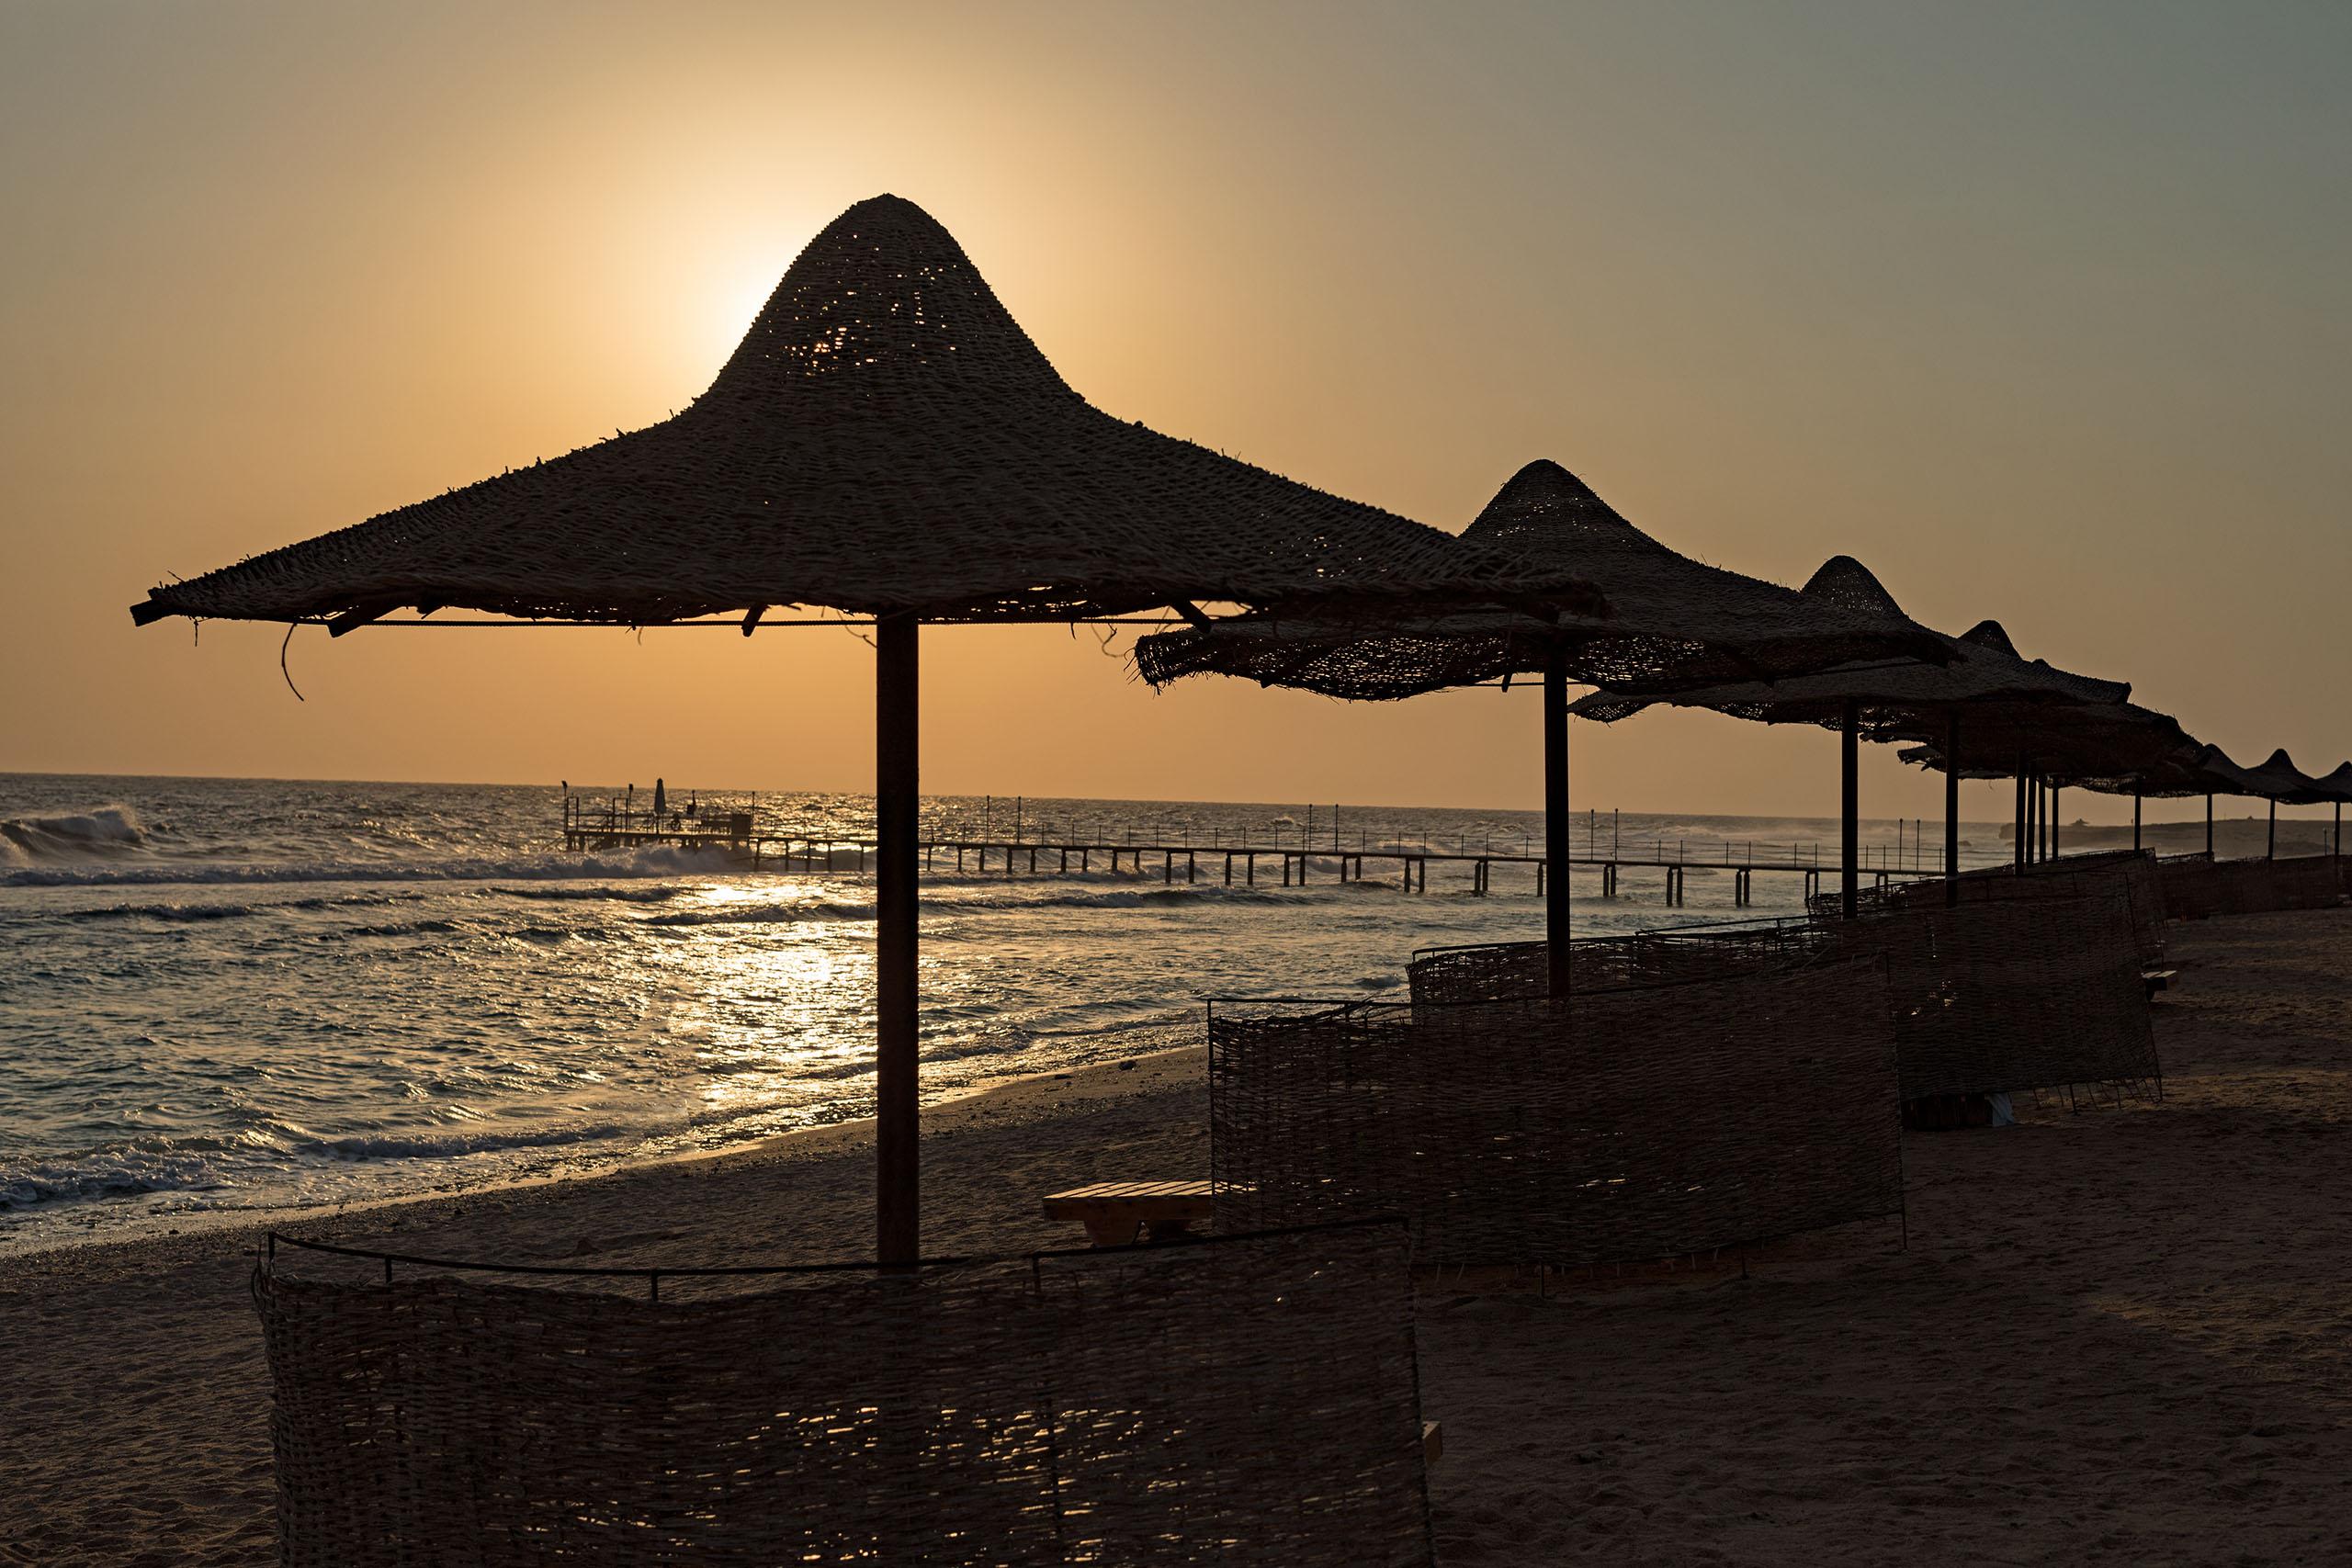 Sonnenaufgang - Egypt, Ägyptenreise nach Marsa Alam 2018. © aadhoc-media • Thomas Rohwedder